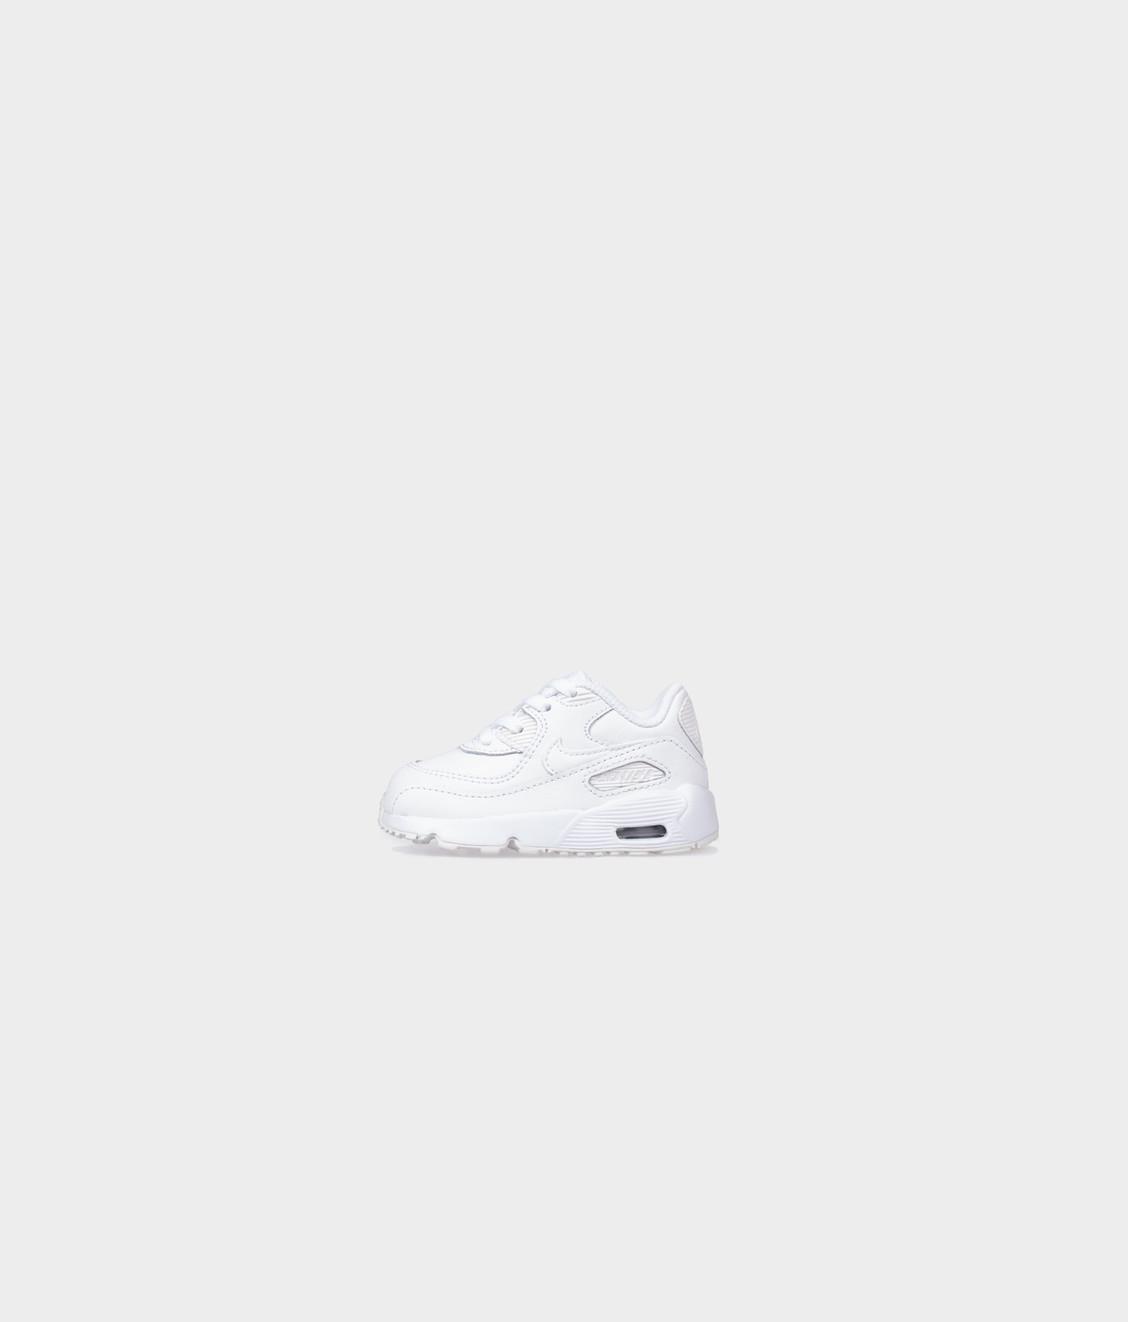 Nike Nike Air Max 90 LTR BT Toddler White